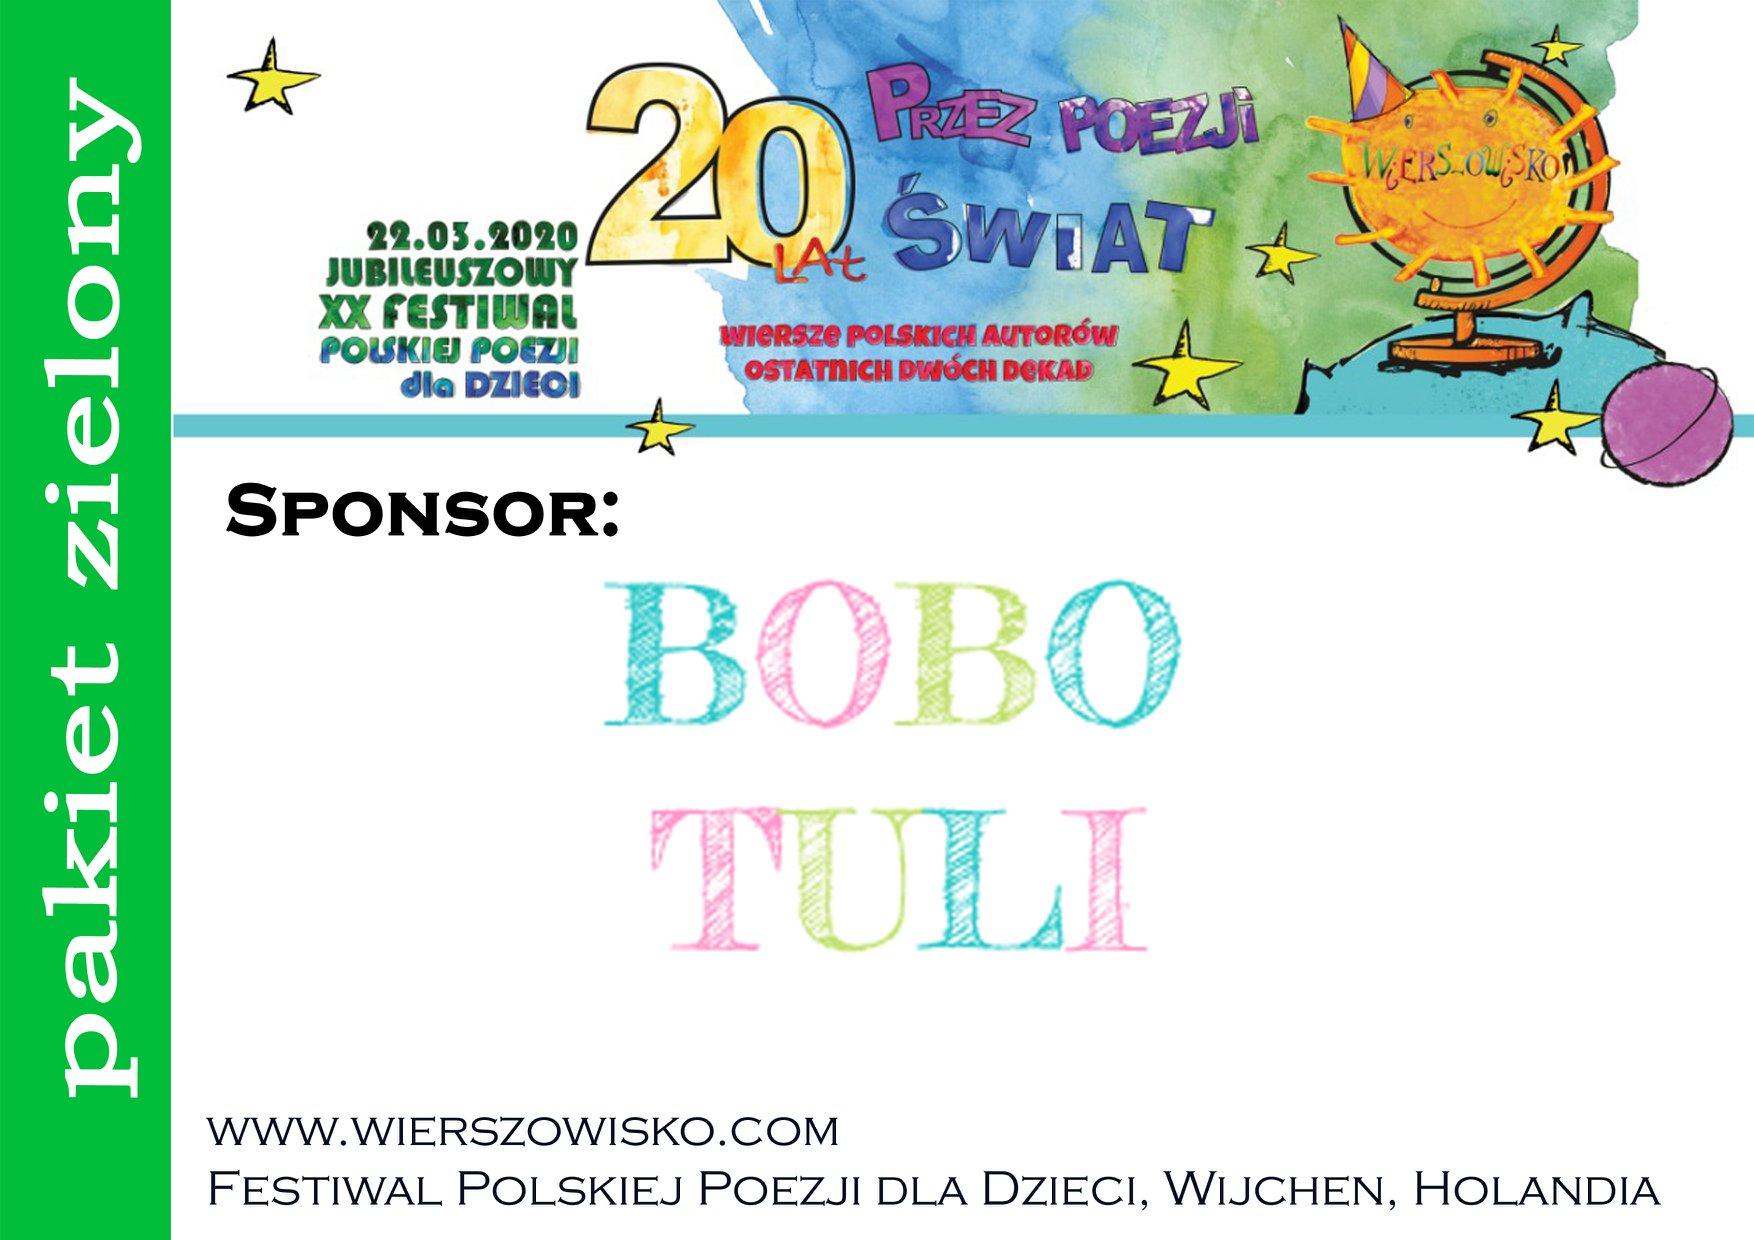 Bobo Tuli